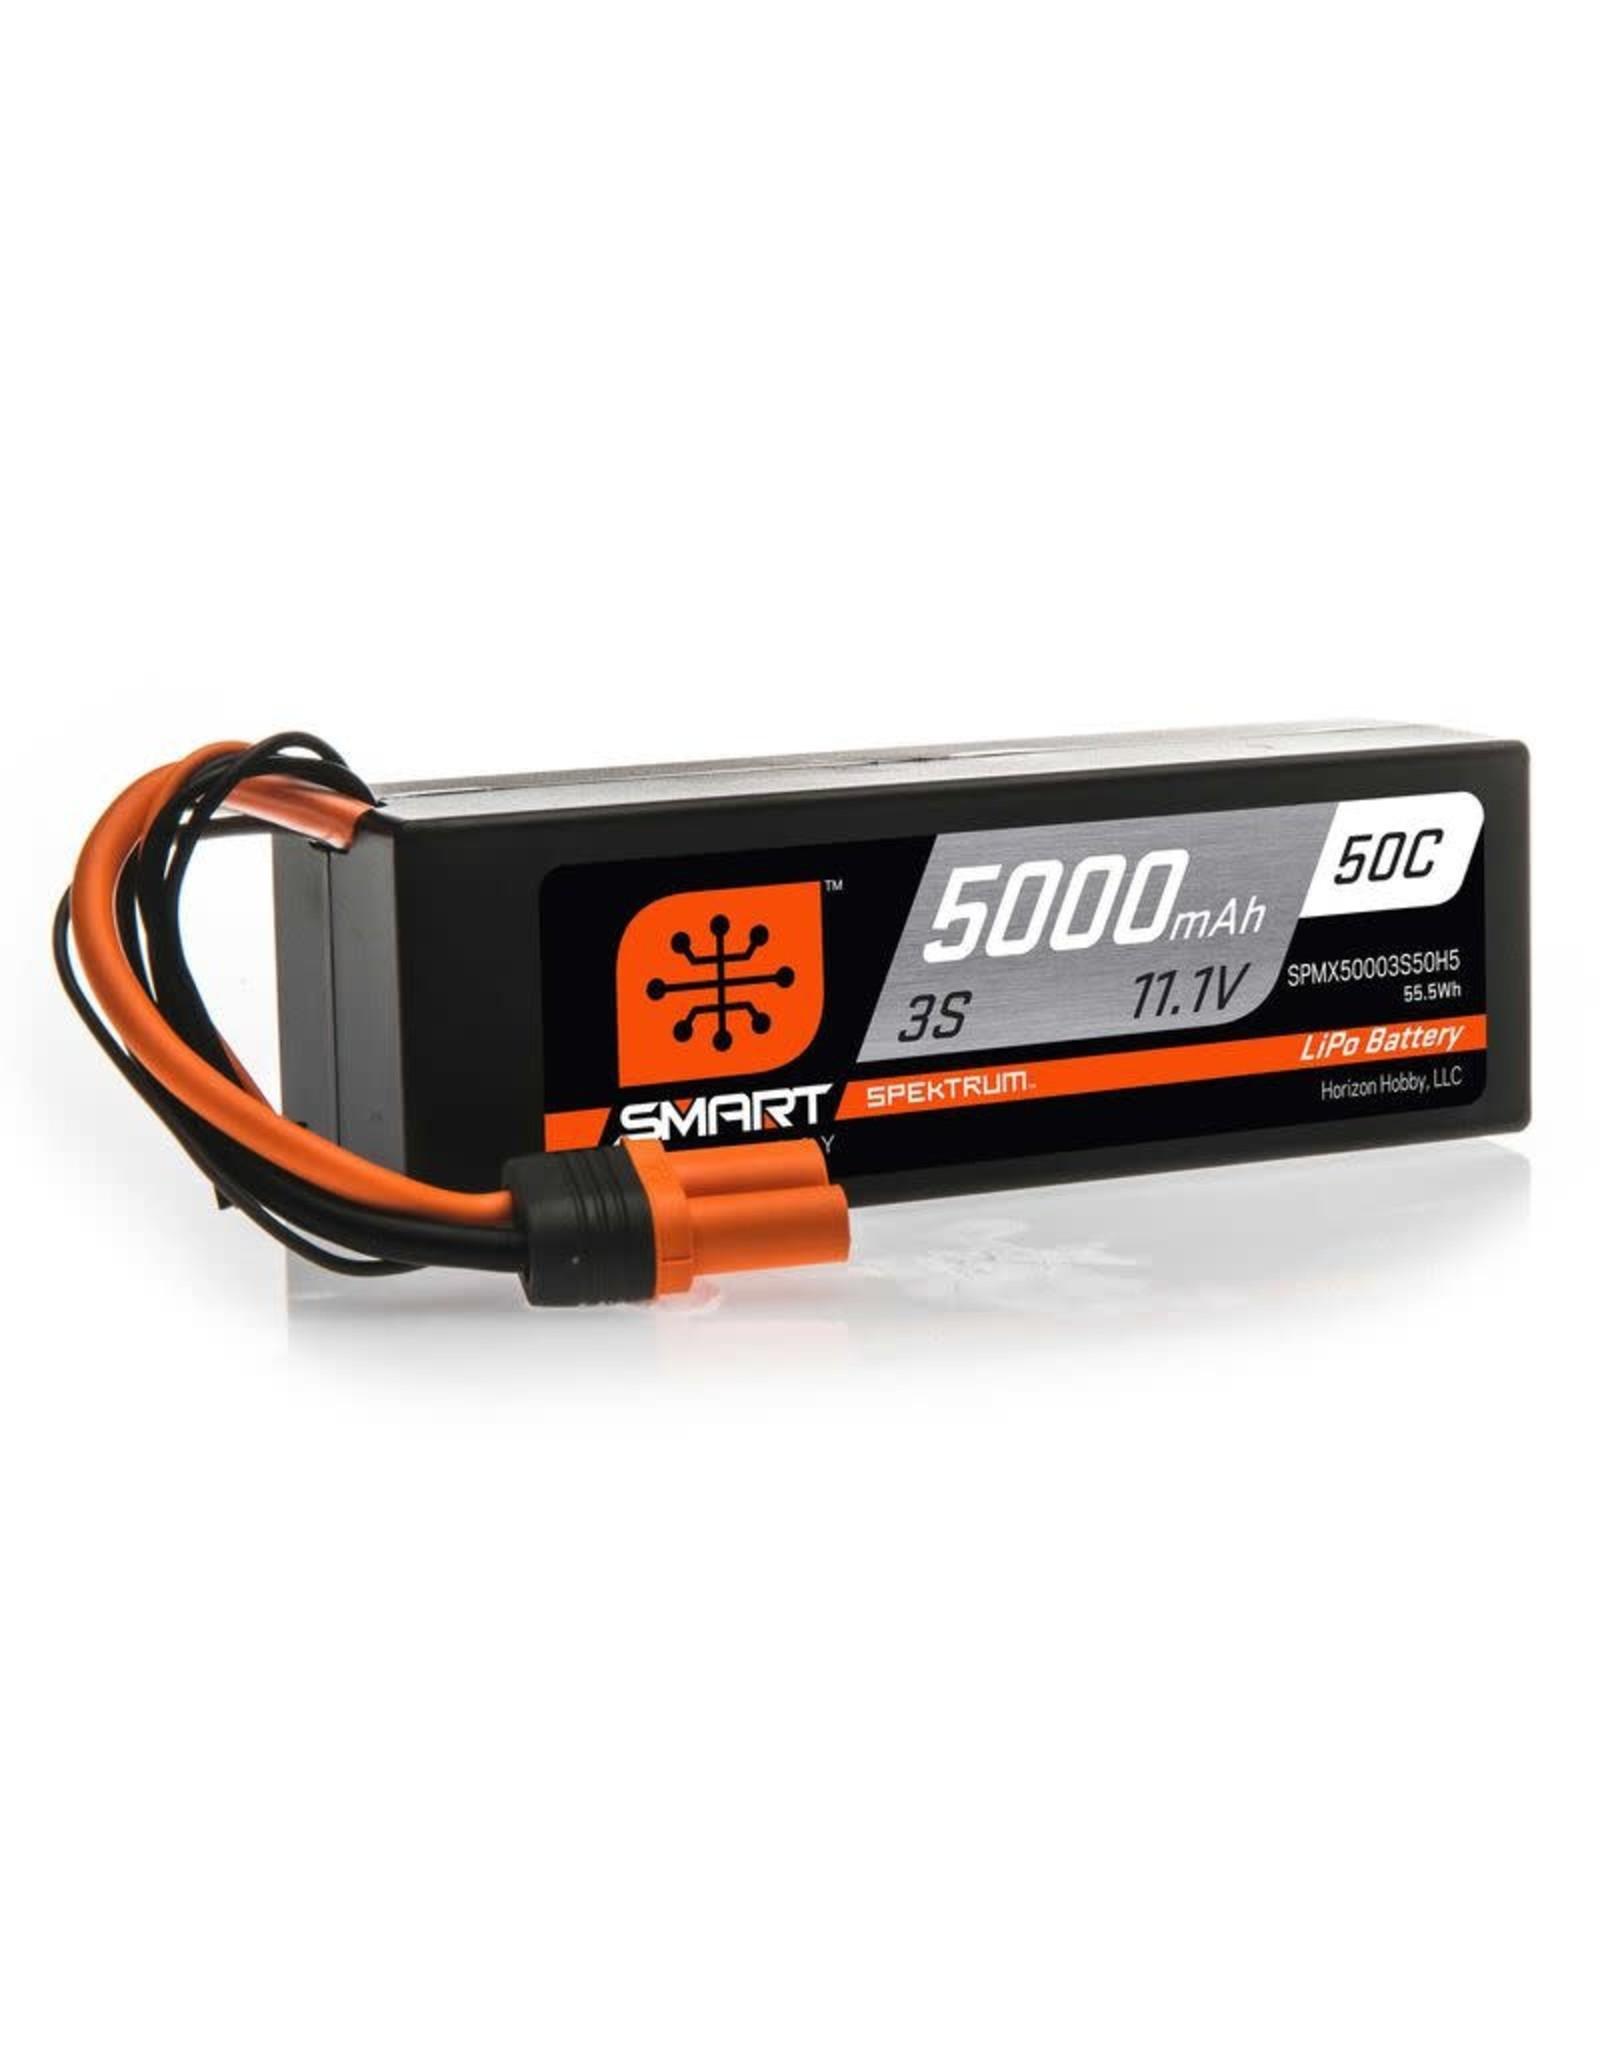 'Spektrum 11.1V 5000mAh 3S 50C Smart Hardcase LiPo Battery: IC5